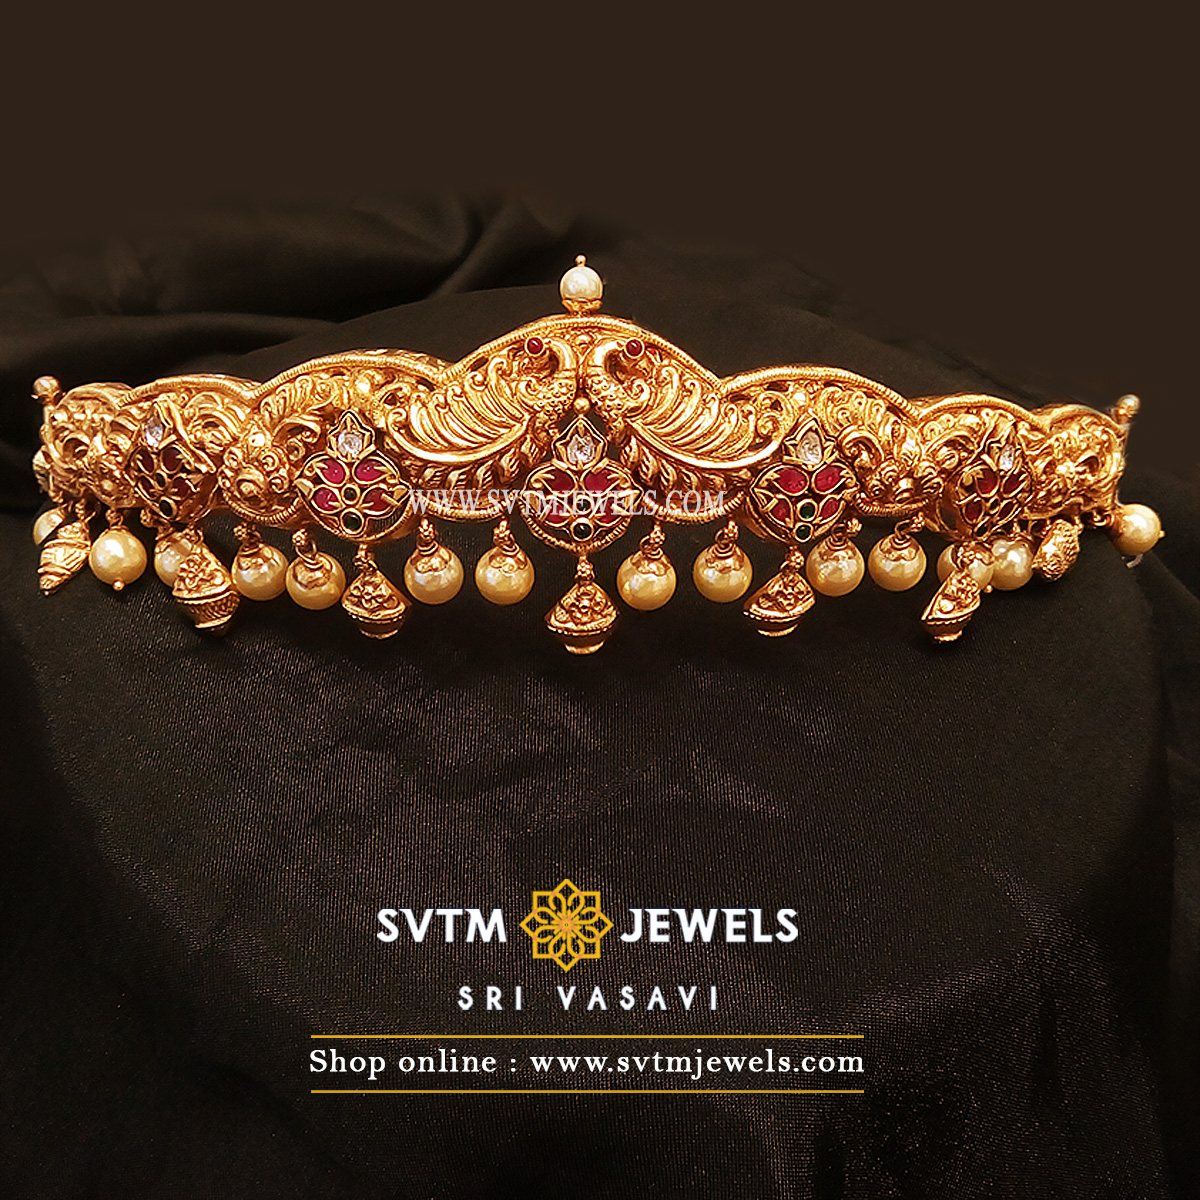 vaddanam-ottiyanam-hip-belt-designs (13)